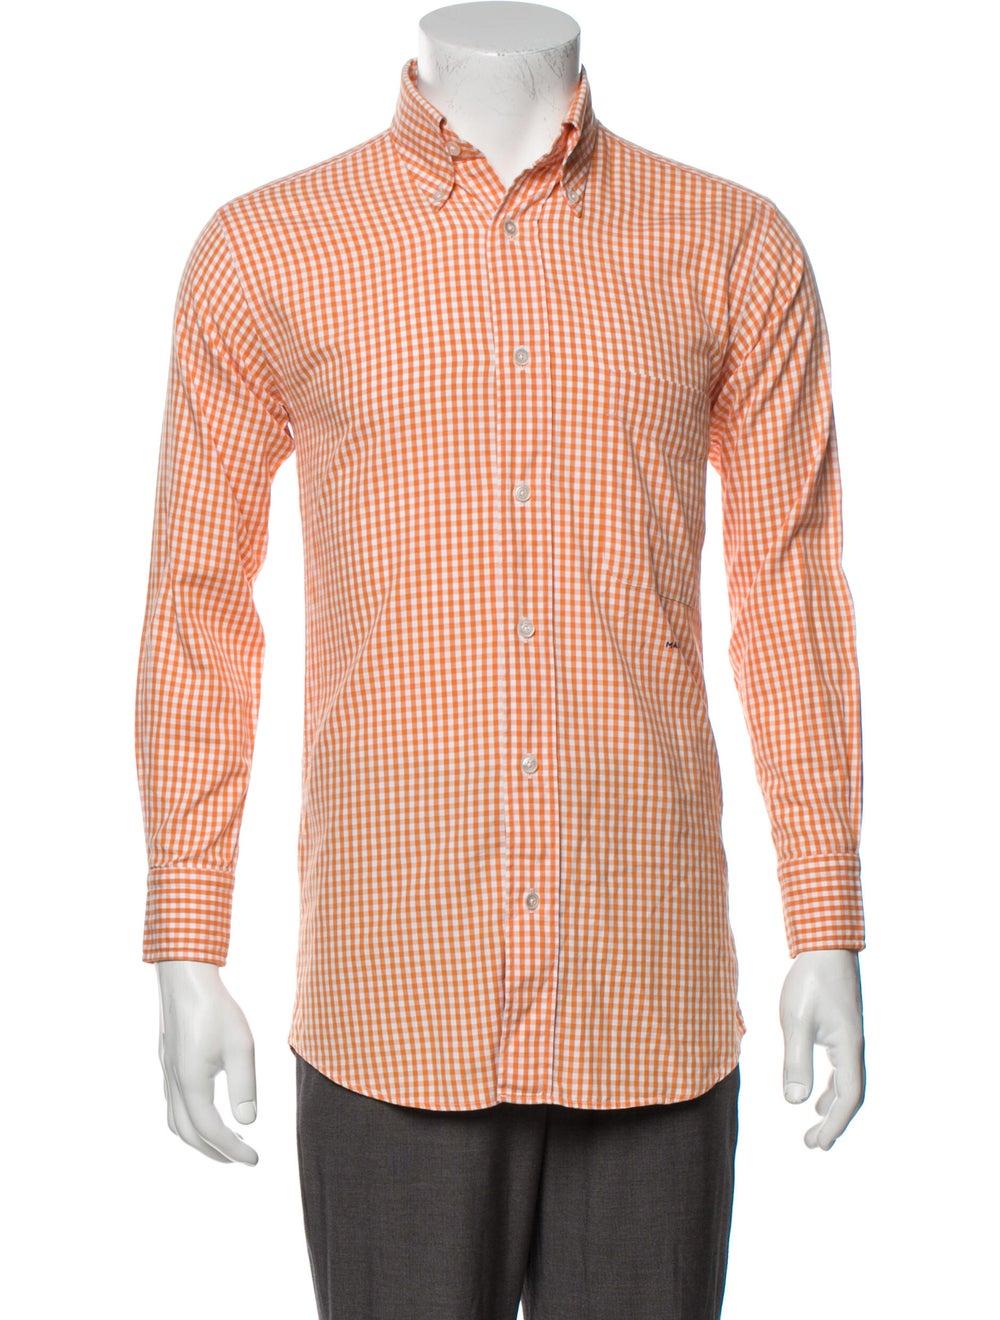 Hermès Vintage Plaid Print Shirt Orange - image 1